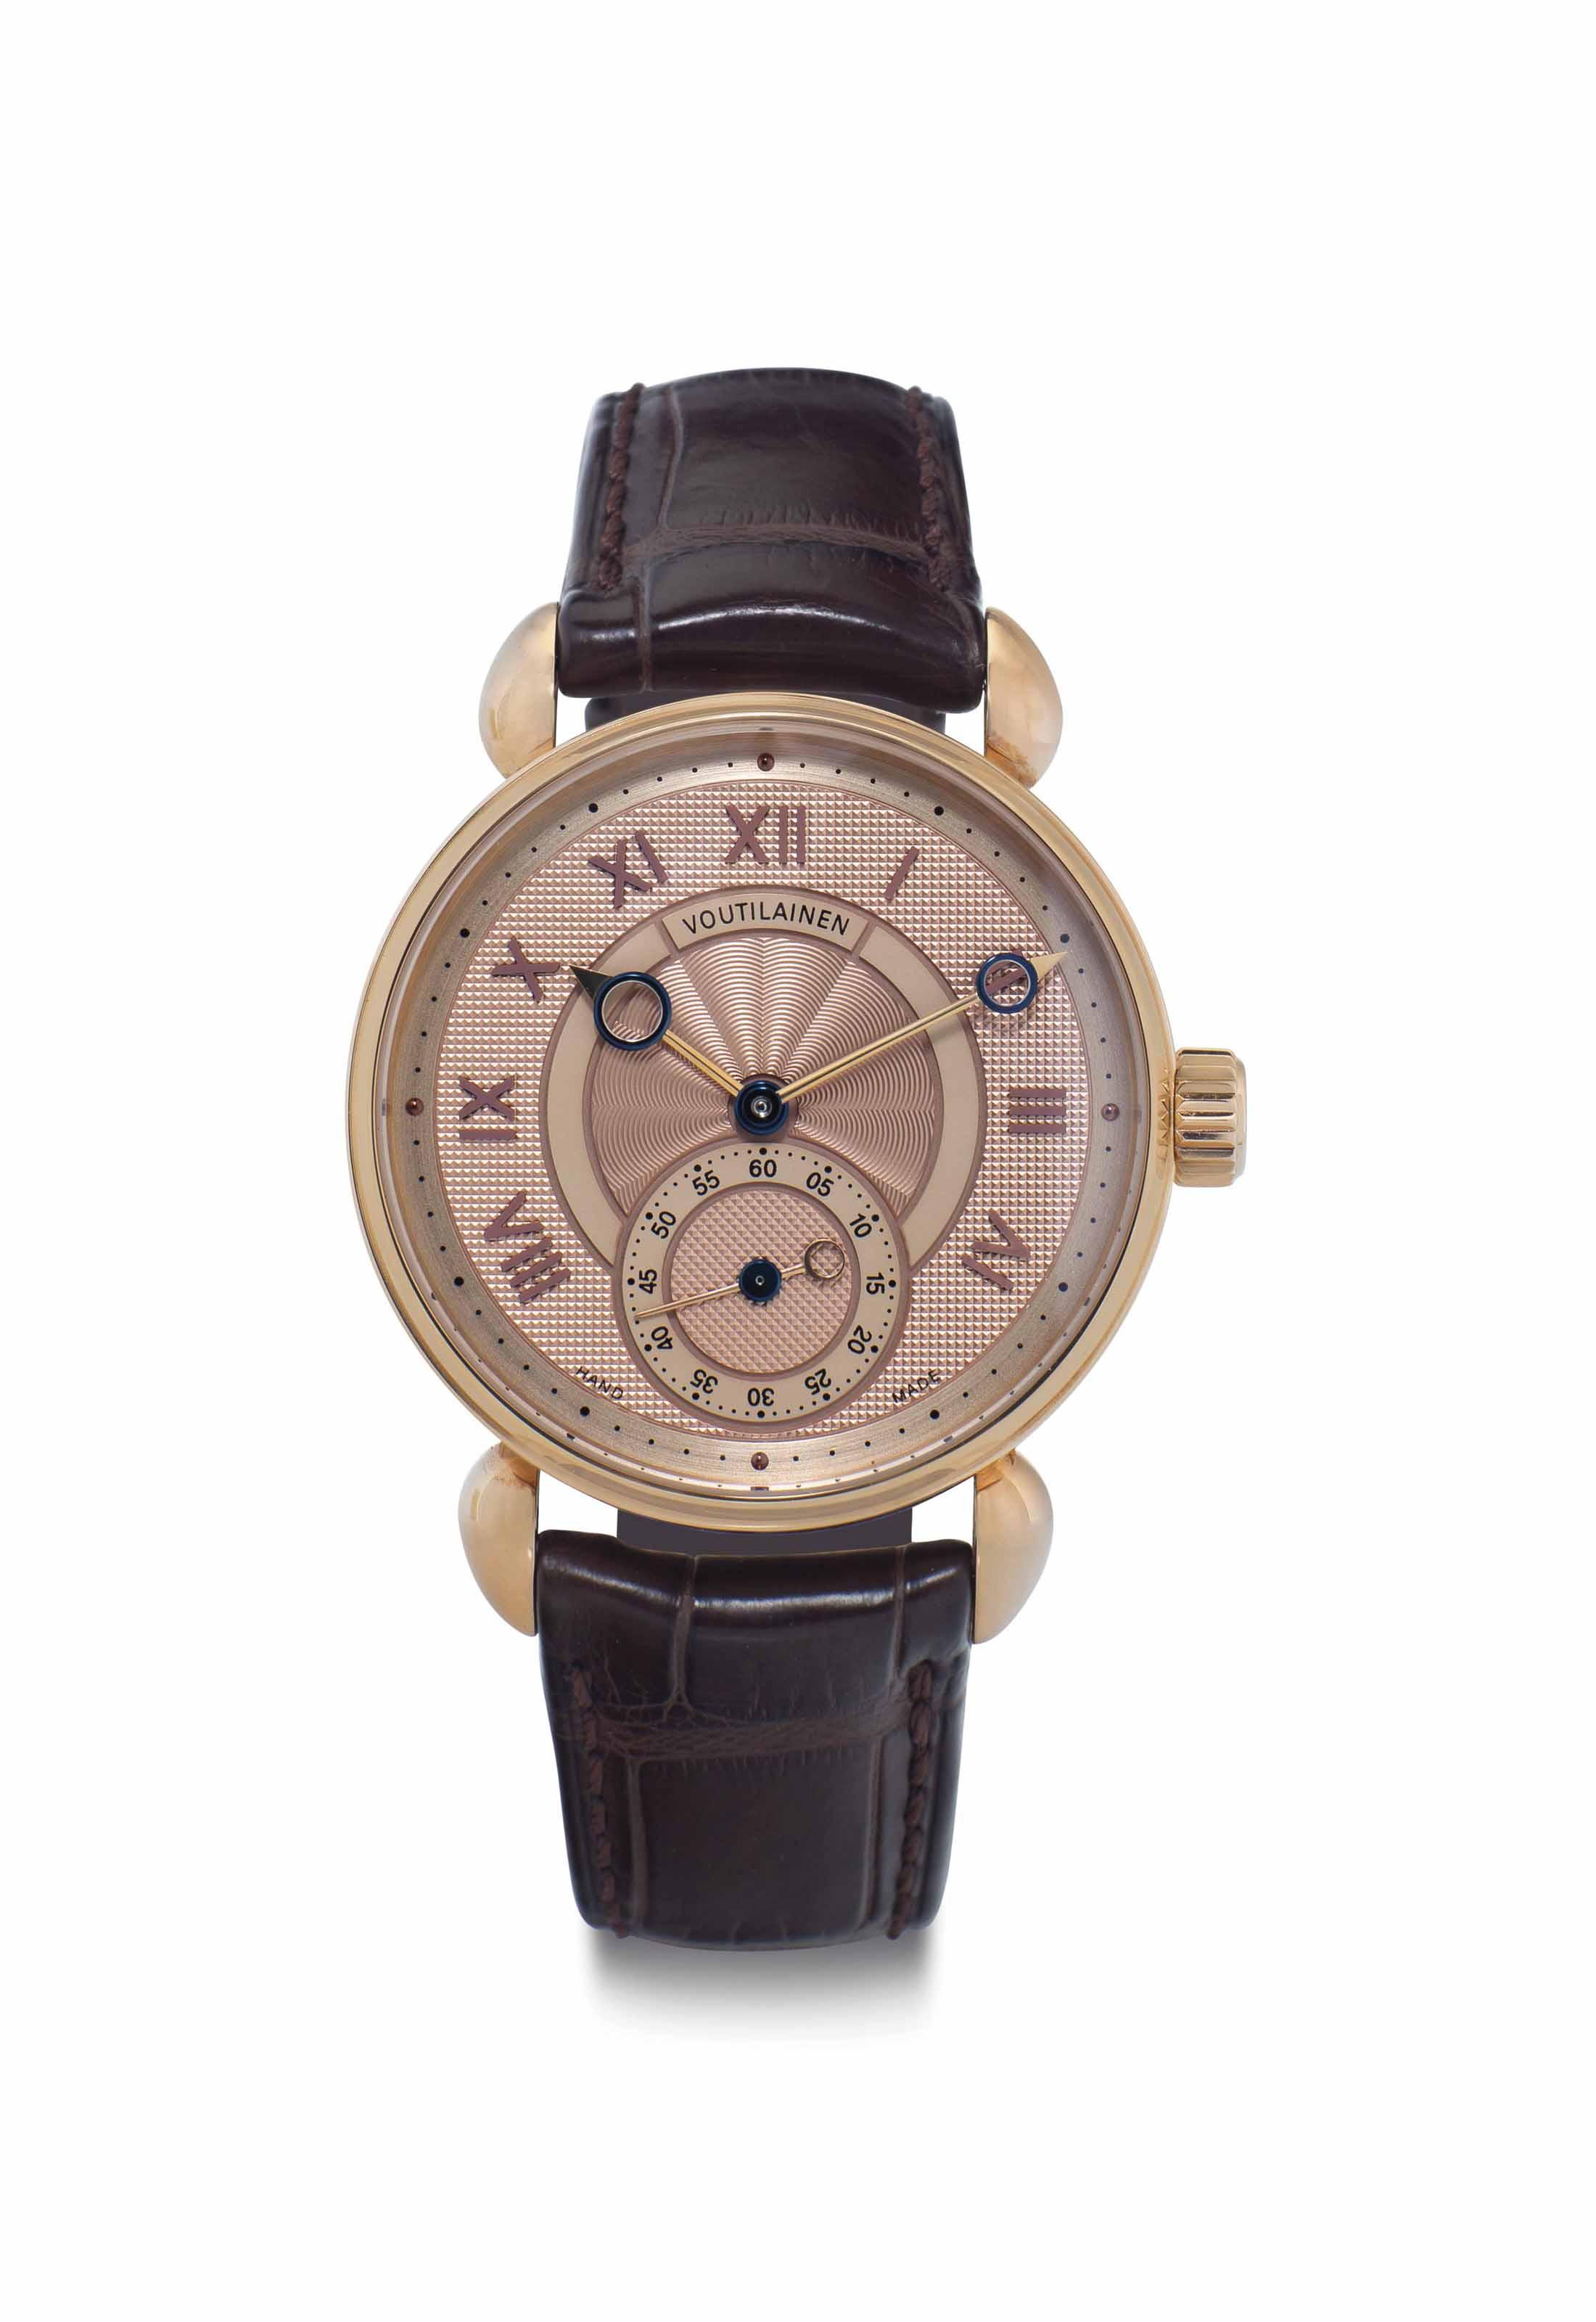 Kari Voutilainen. A Very Fine and Unique 18k Pink Gold Wristwatch